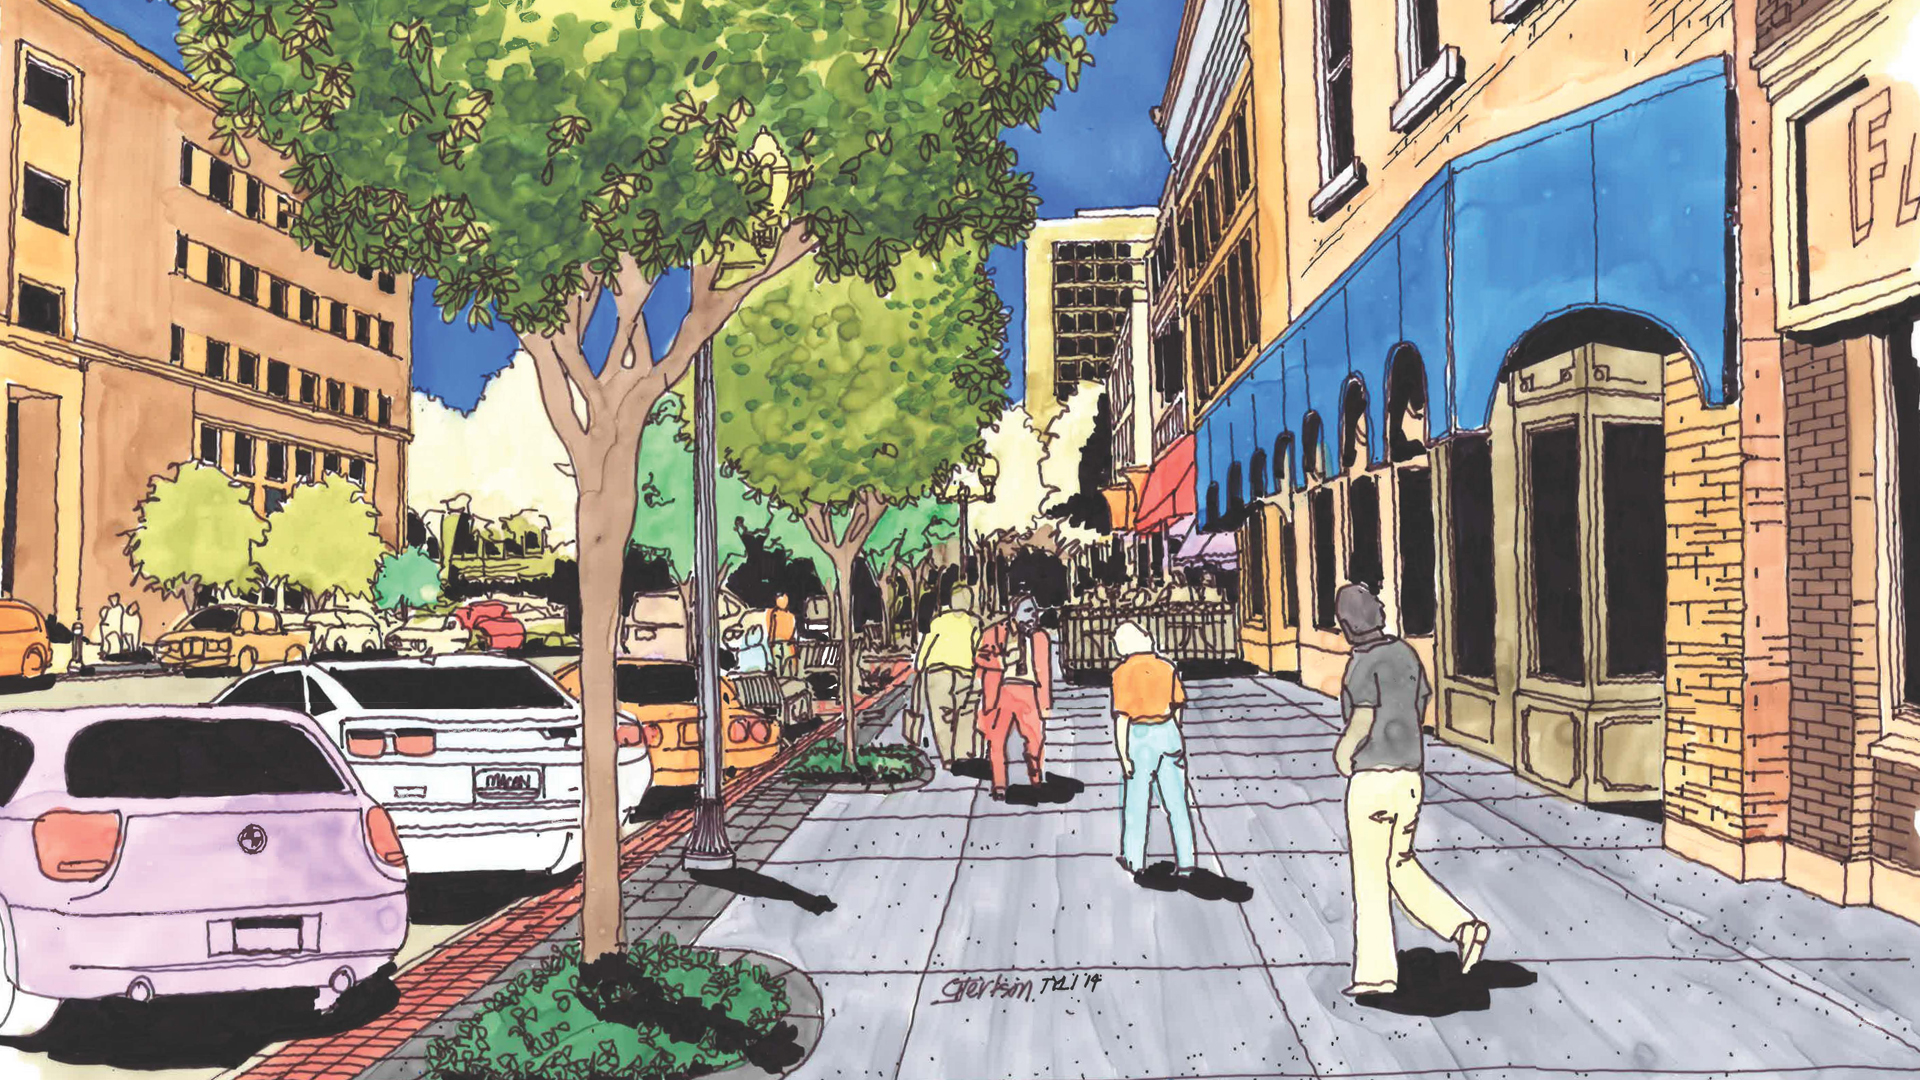 Second Street Vision Block